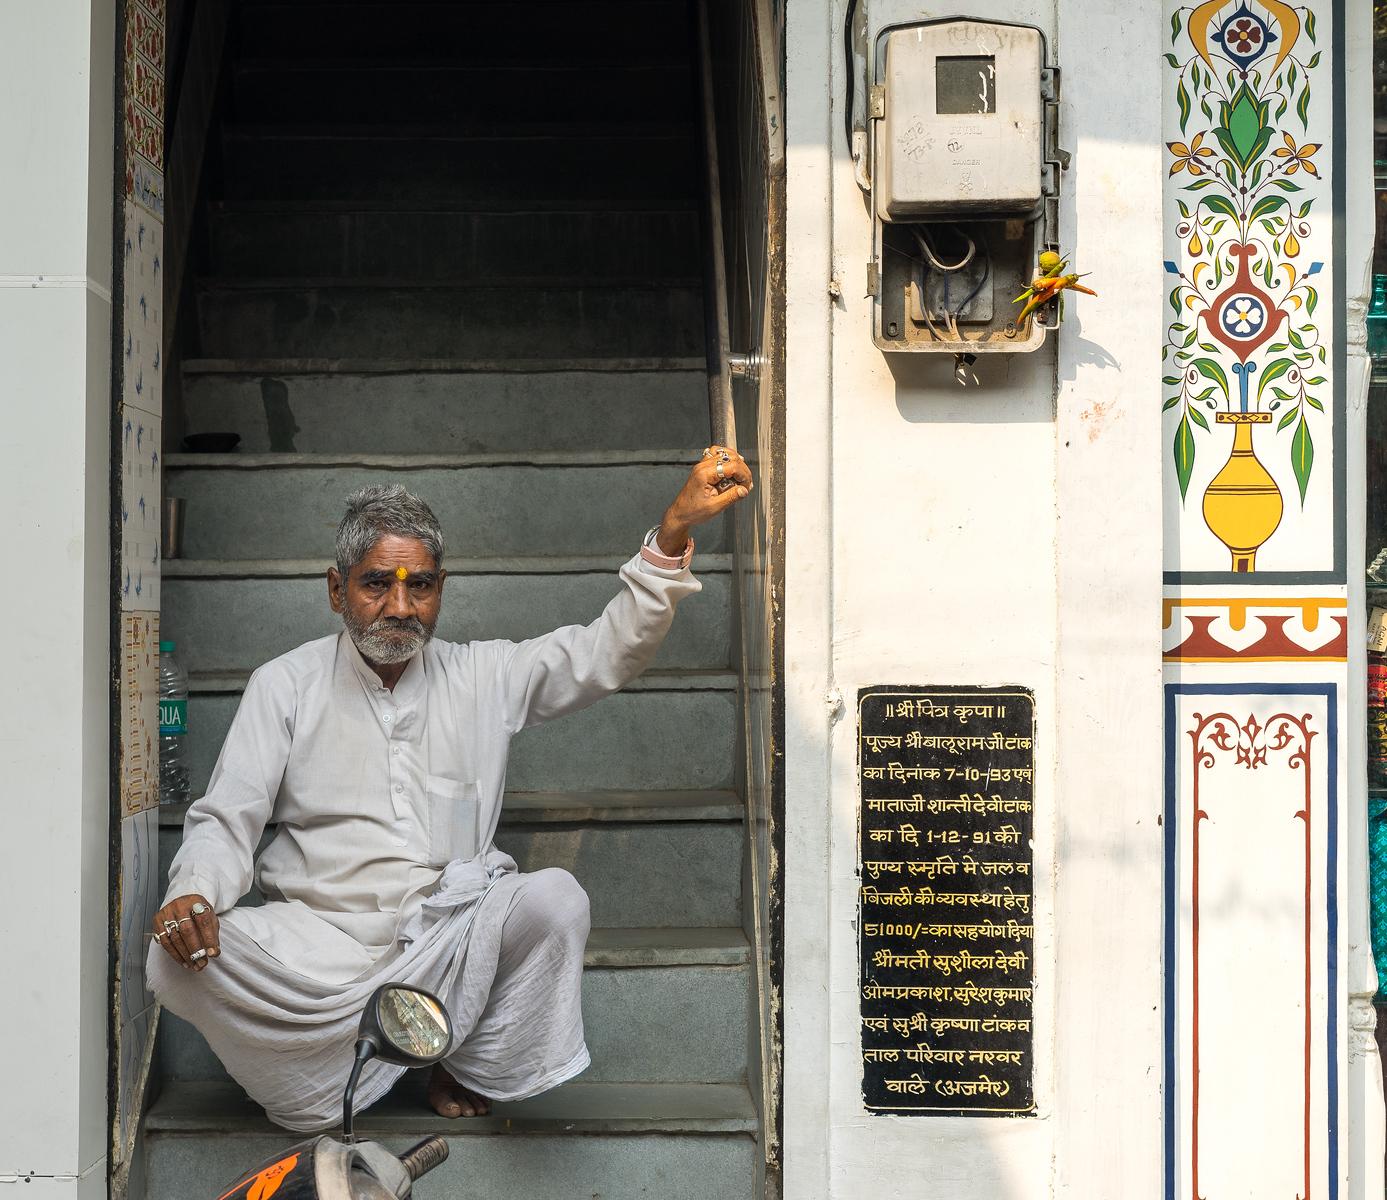 Vibrant people of Pushkar India